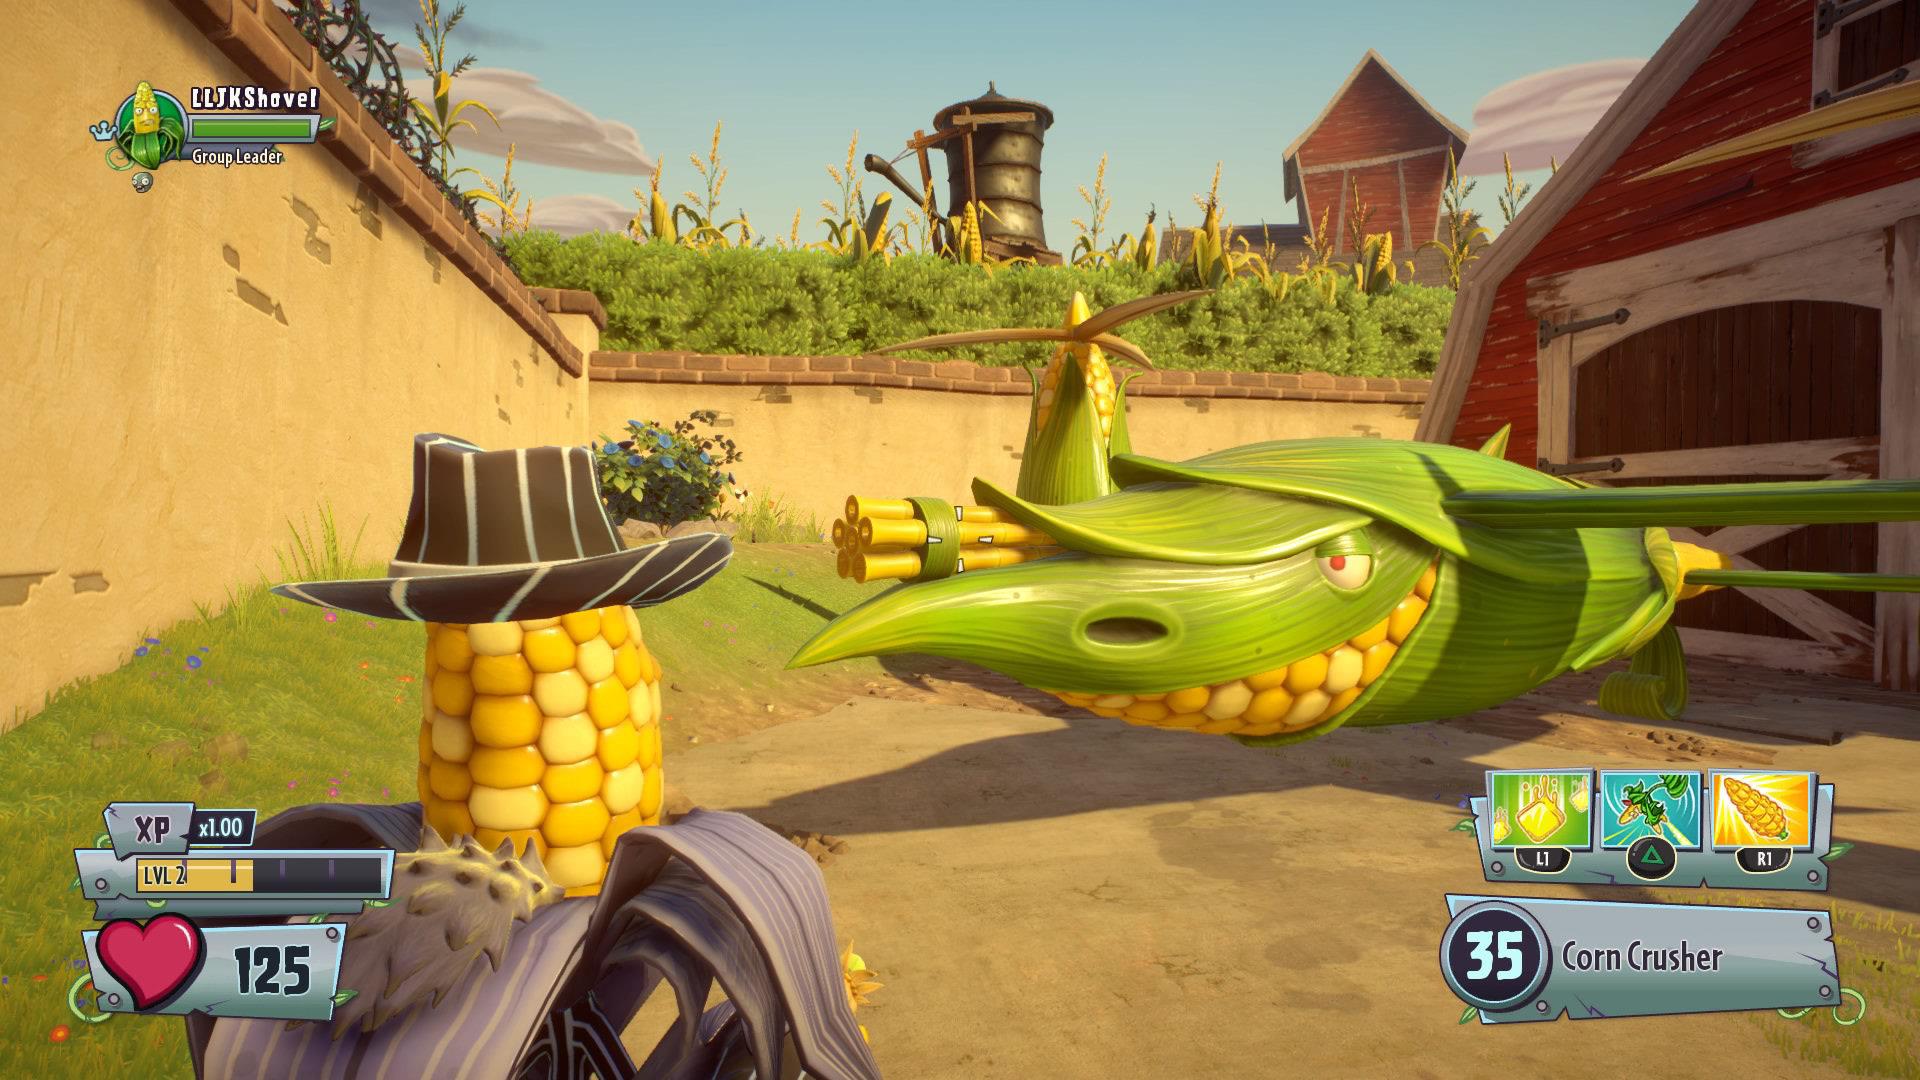 Plants Vs Zombies Garden Warfare 2 On Alkuvuoden Hauskimpia Nettir Iskint J Pc Ps4 Xbox One